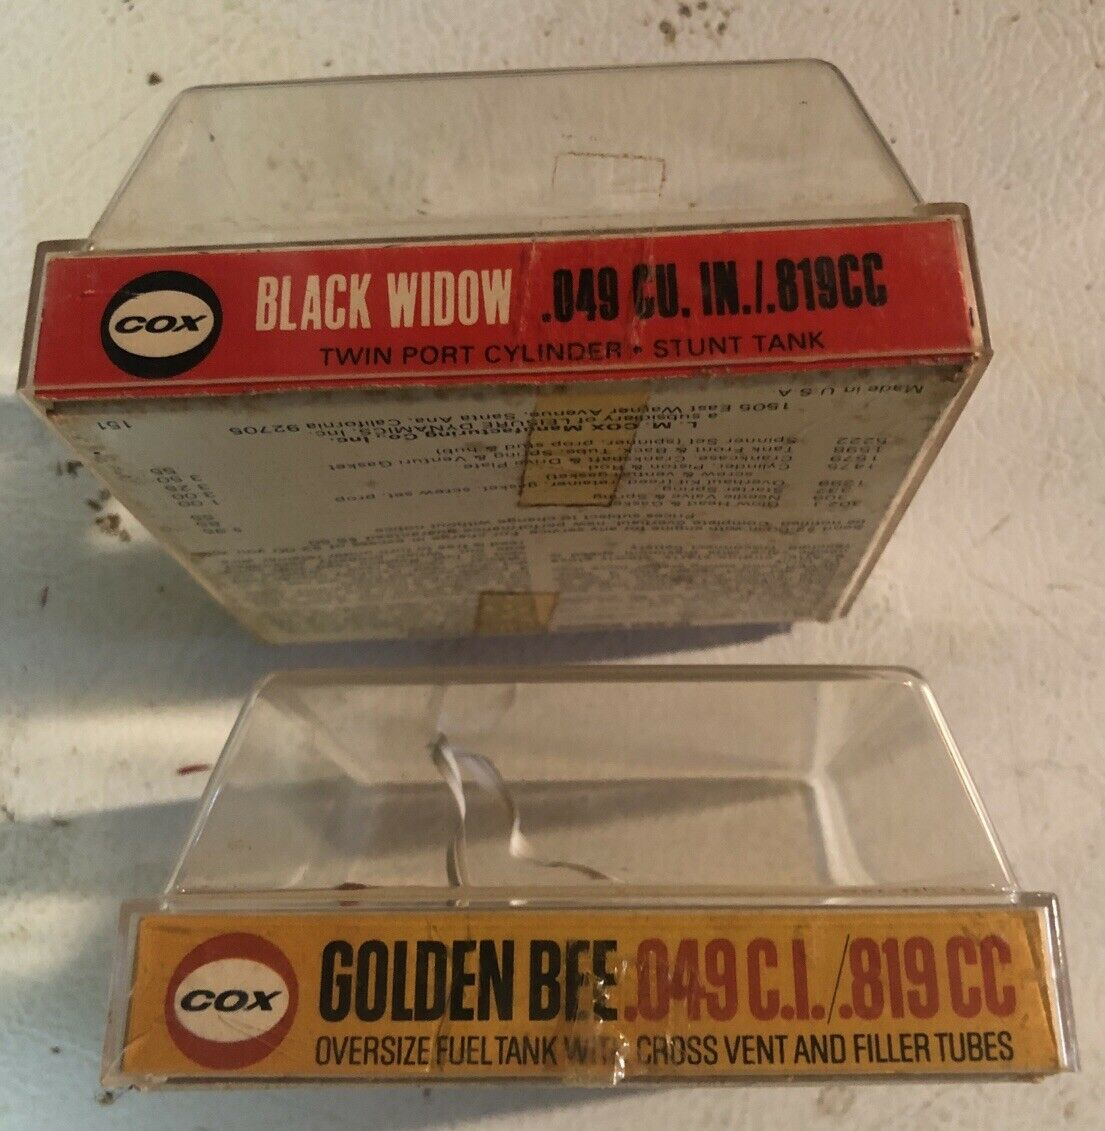 Black Widow Canadian Package  S-l16031